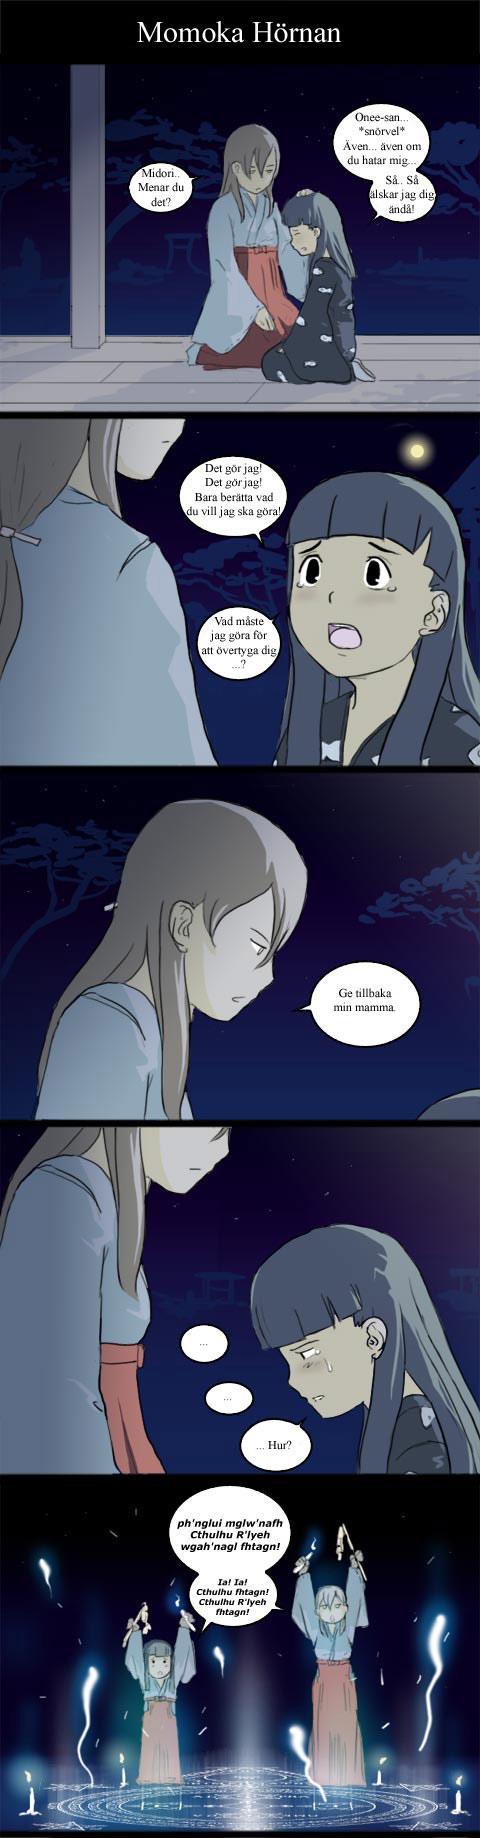 [Momoka Corner- strip 4]